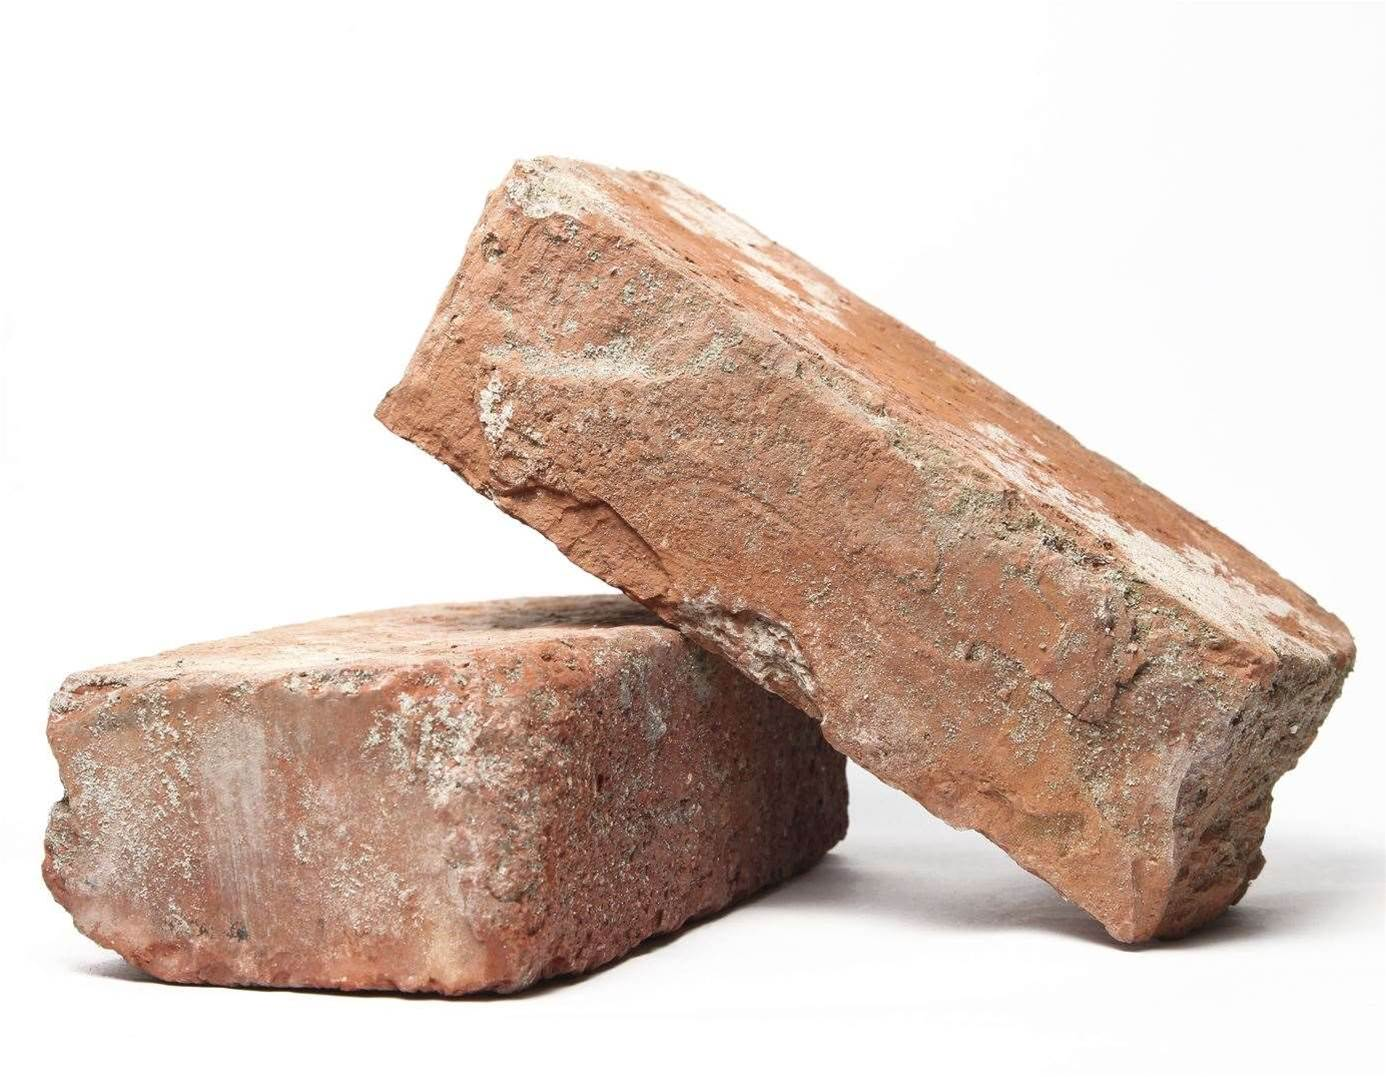 Apple's iOS 10 update bricks devices